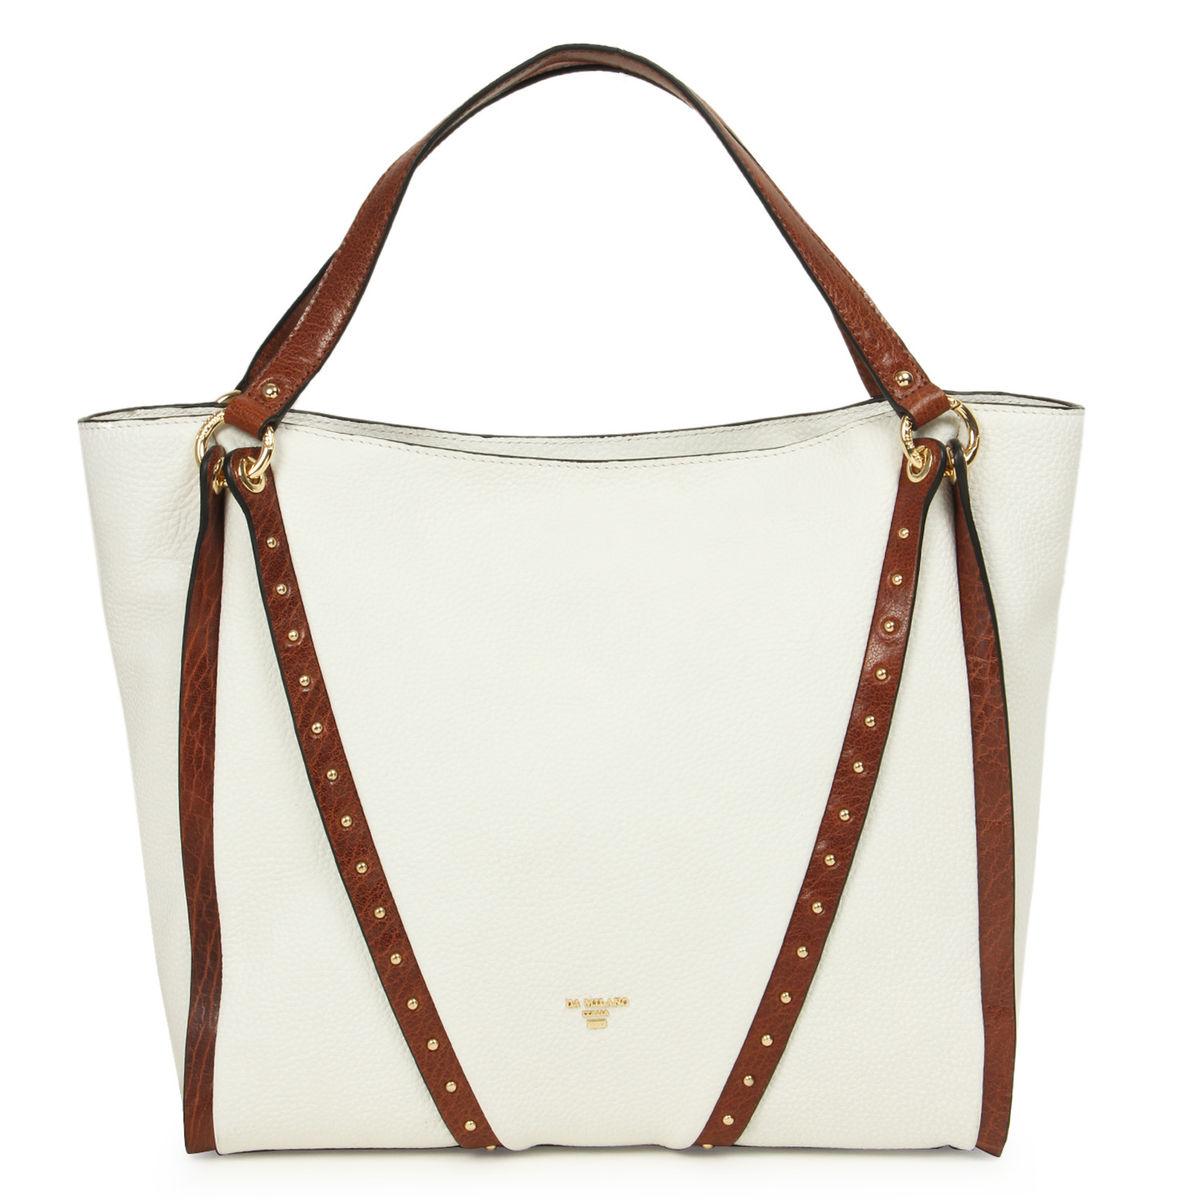 e208a9ff23 ... Da Milano White Con Long Handle Bag. sold-out-image zoom Da ...